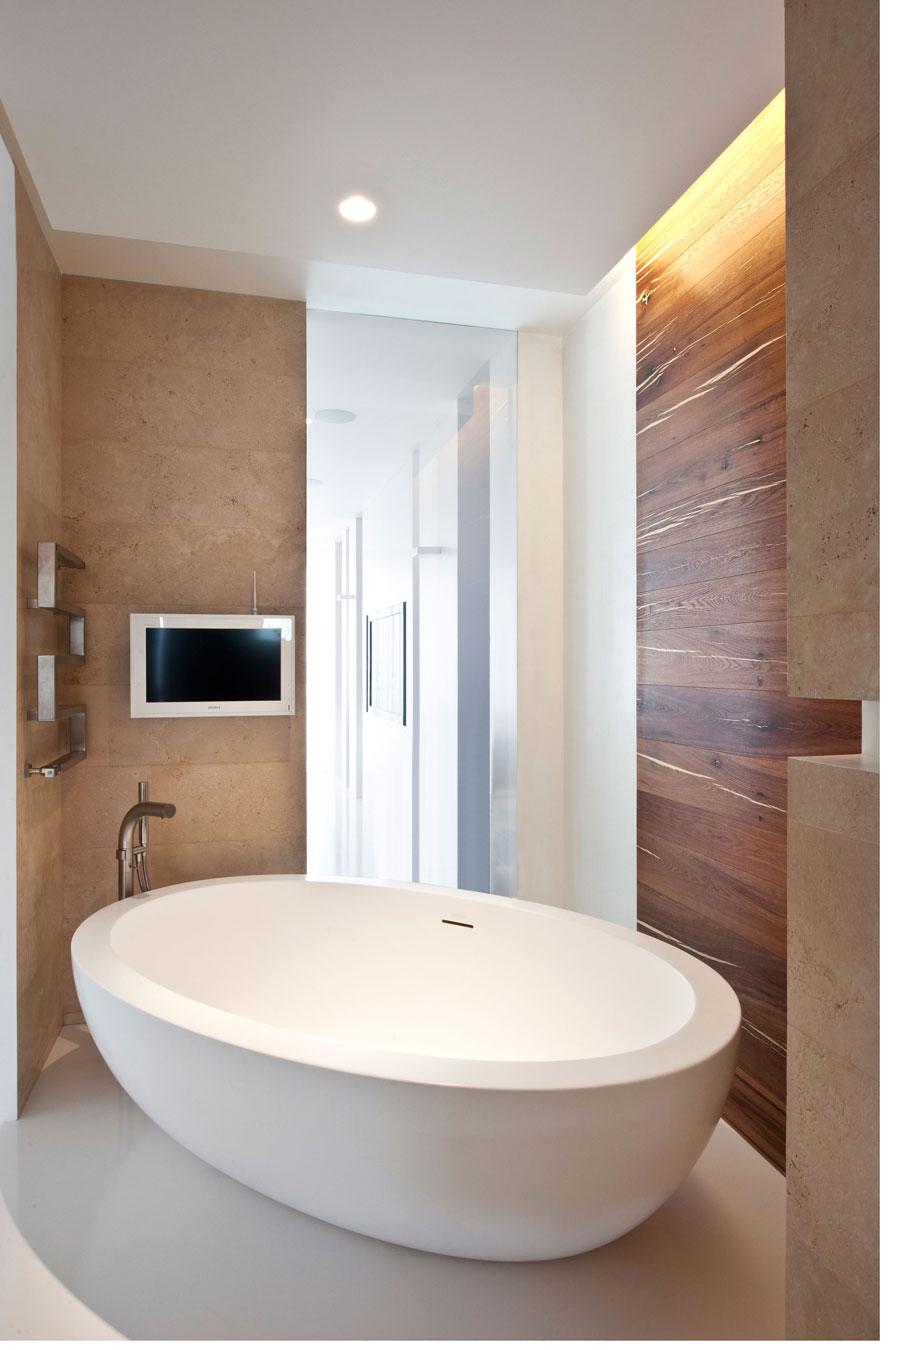 Freestanding modern bath tub interior design ideas